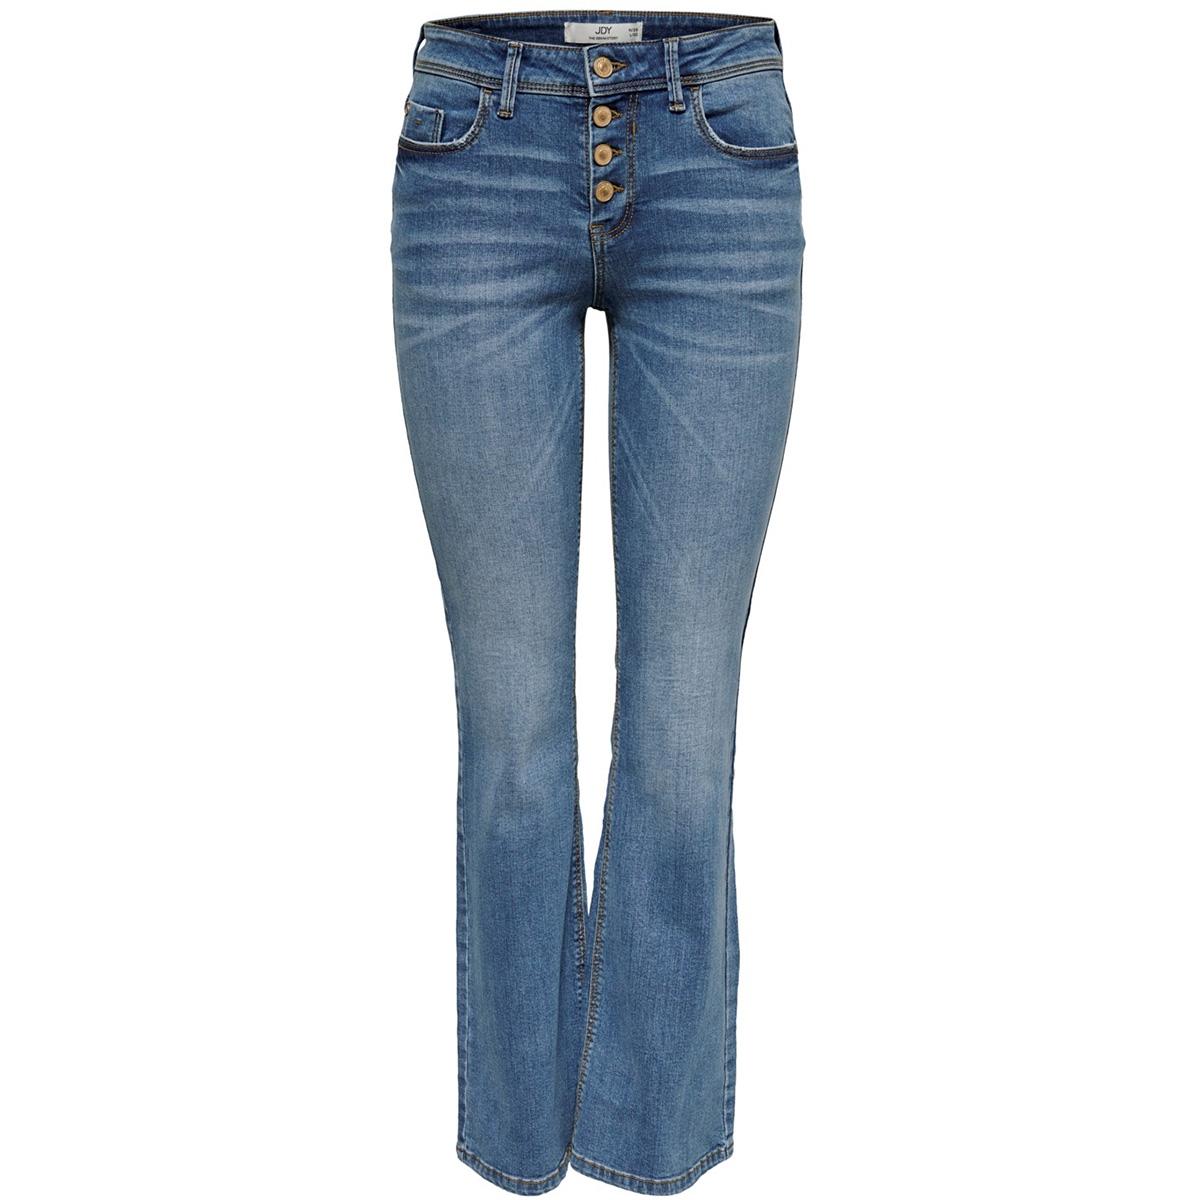 jdyjona flare reg but fly lb dnm 15182661 jacqueline de yong jeans light blue denim